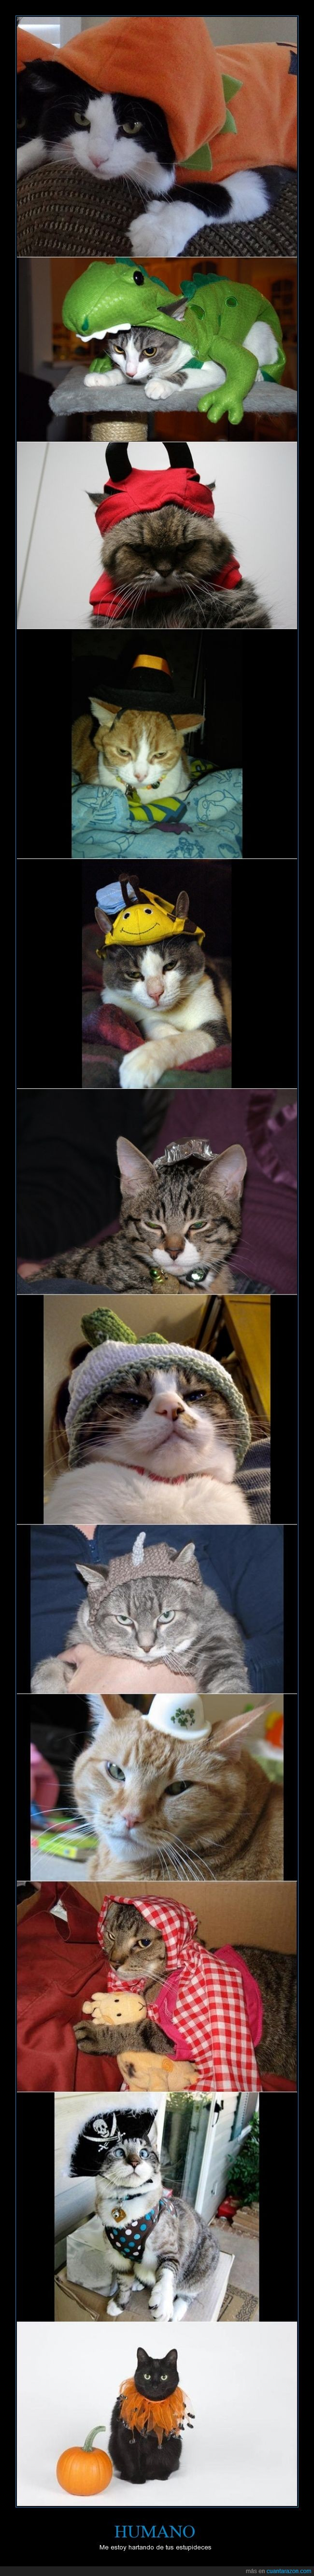 disfraces,Gatos,Halloween,mininos,molestos,odiar